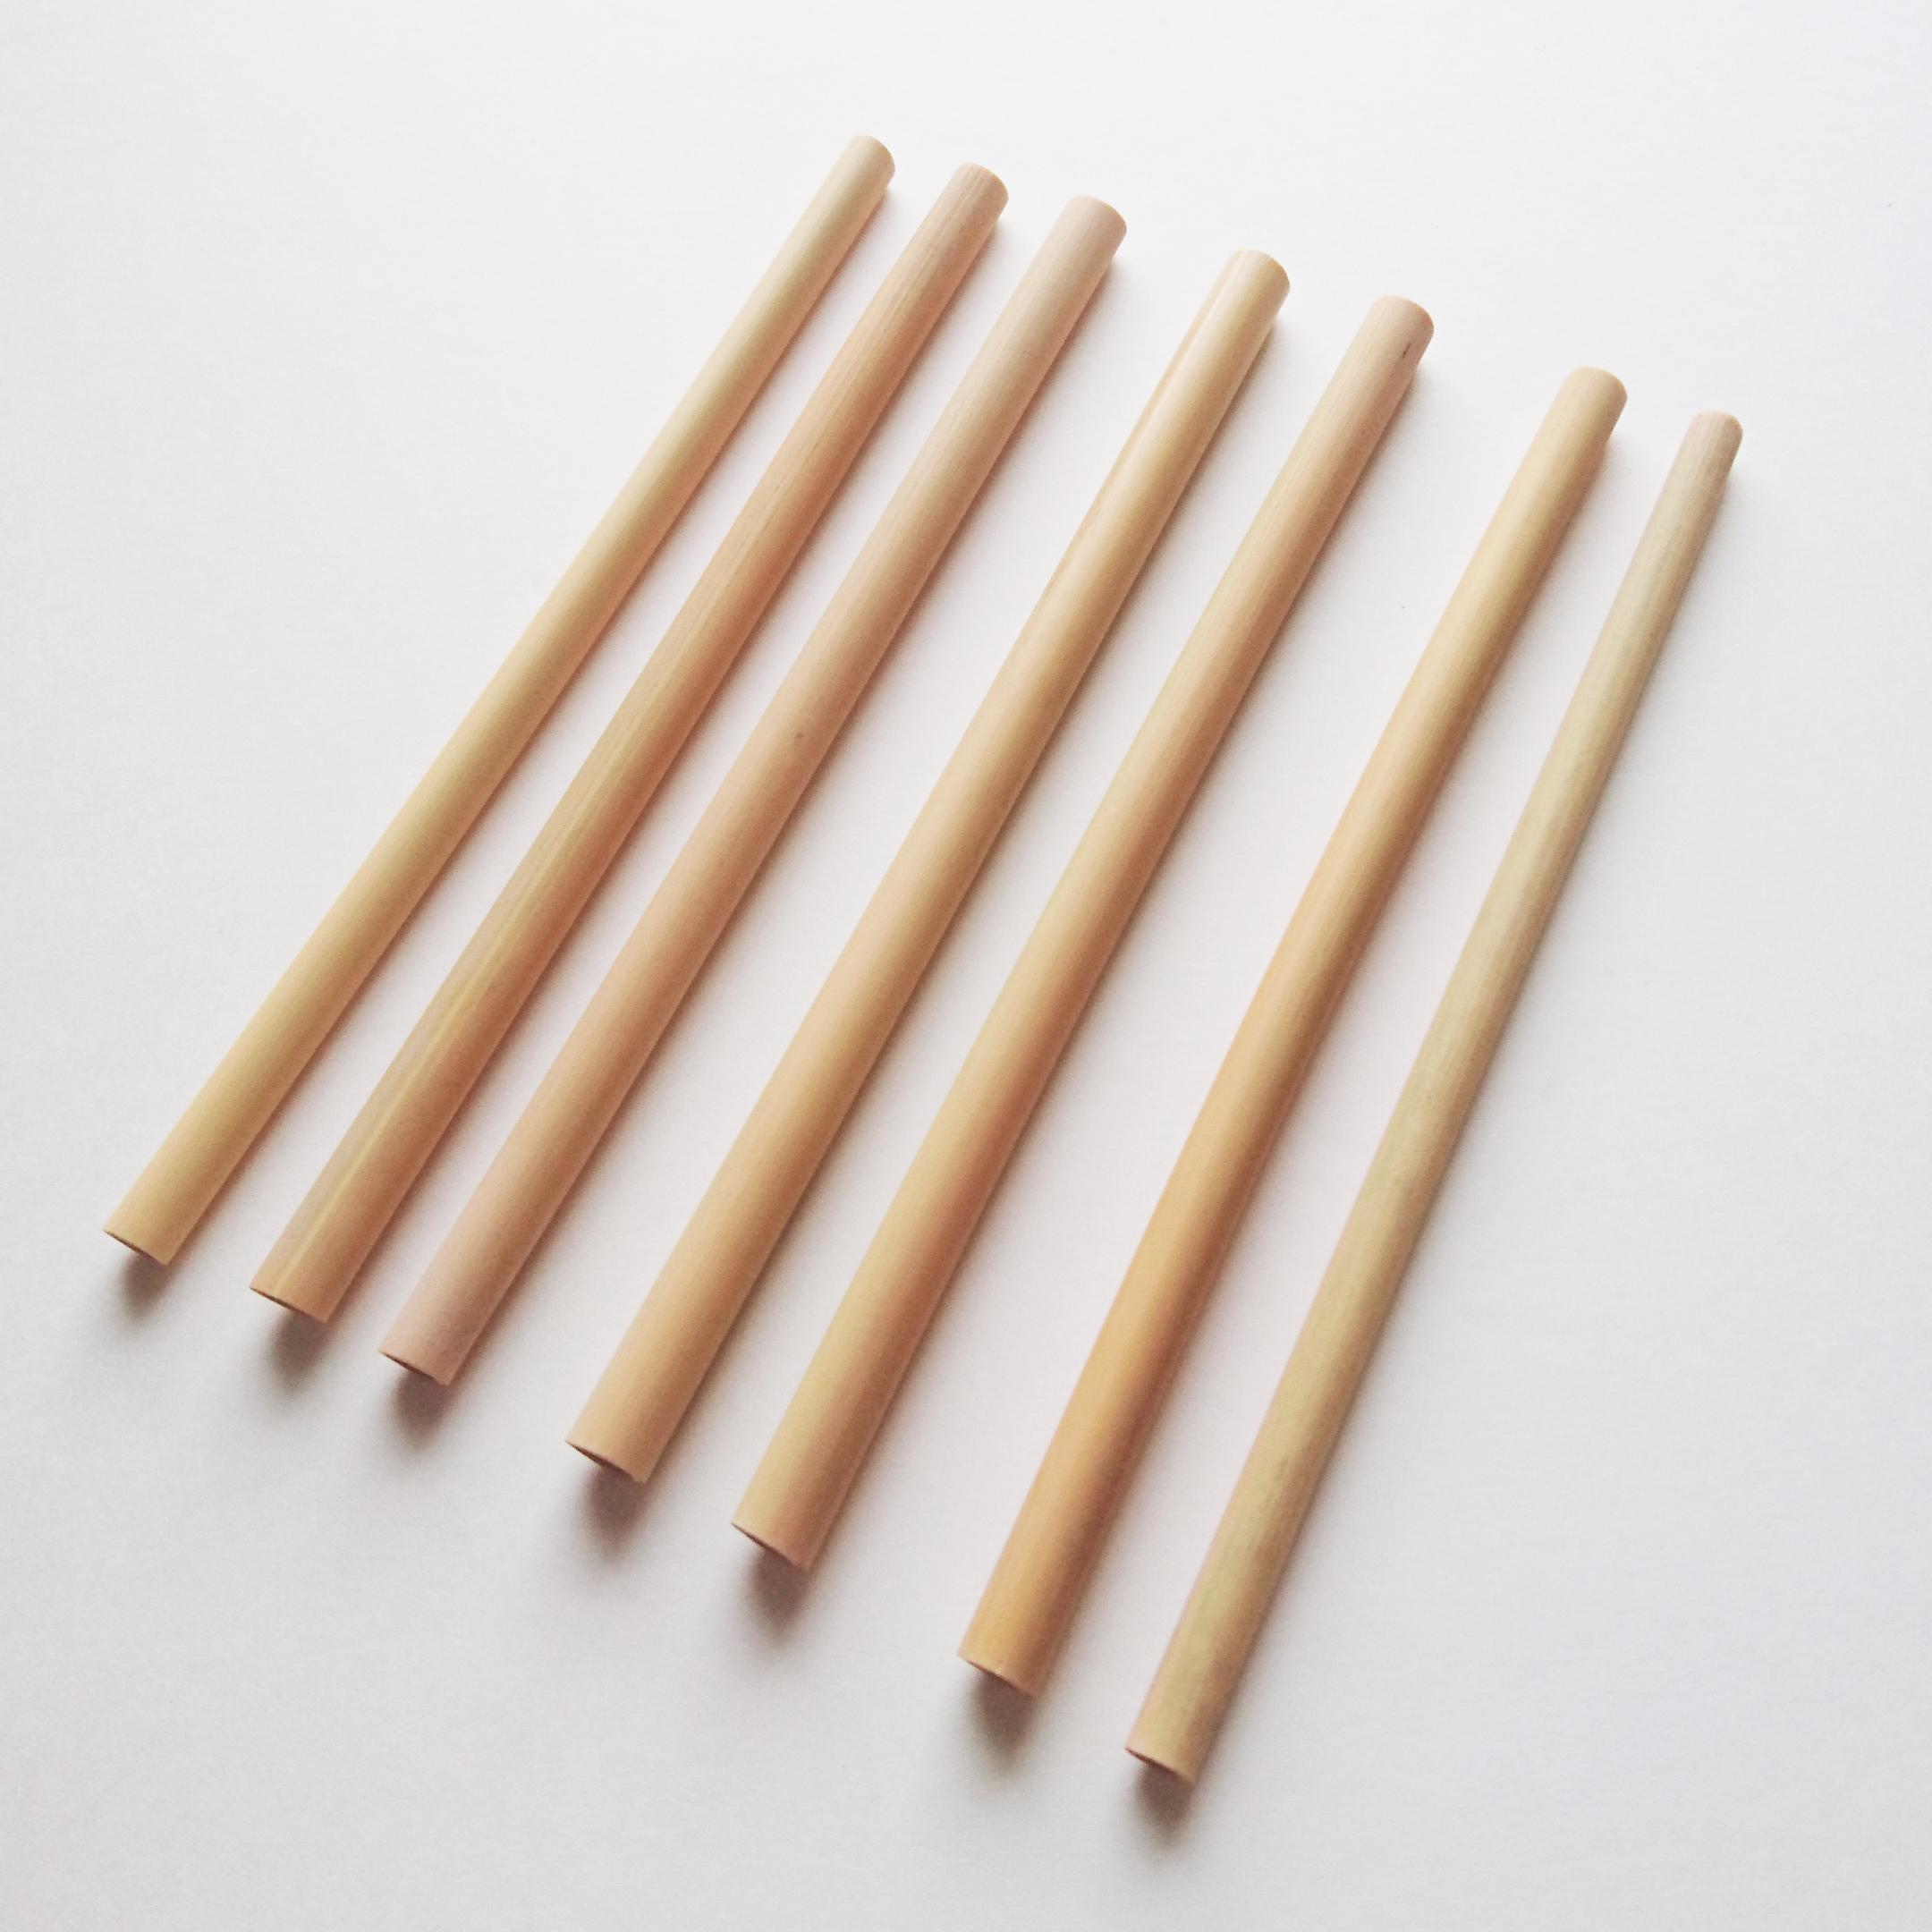 bamboostraw_05